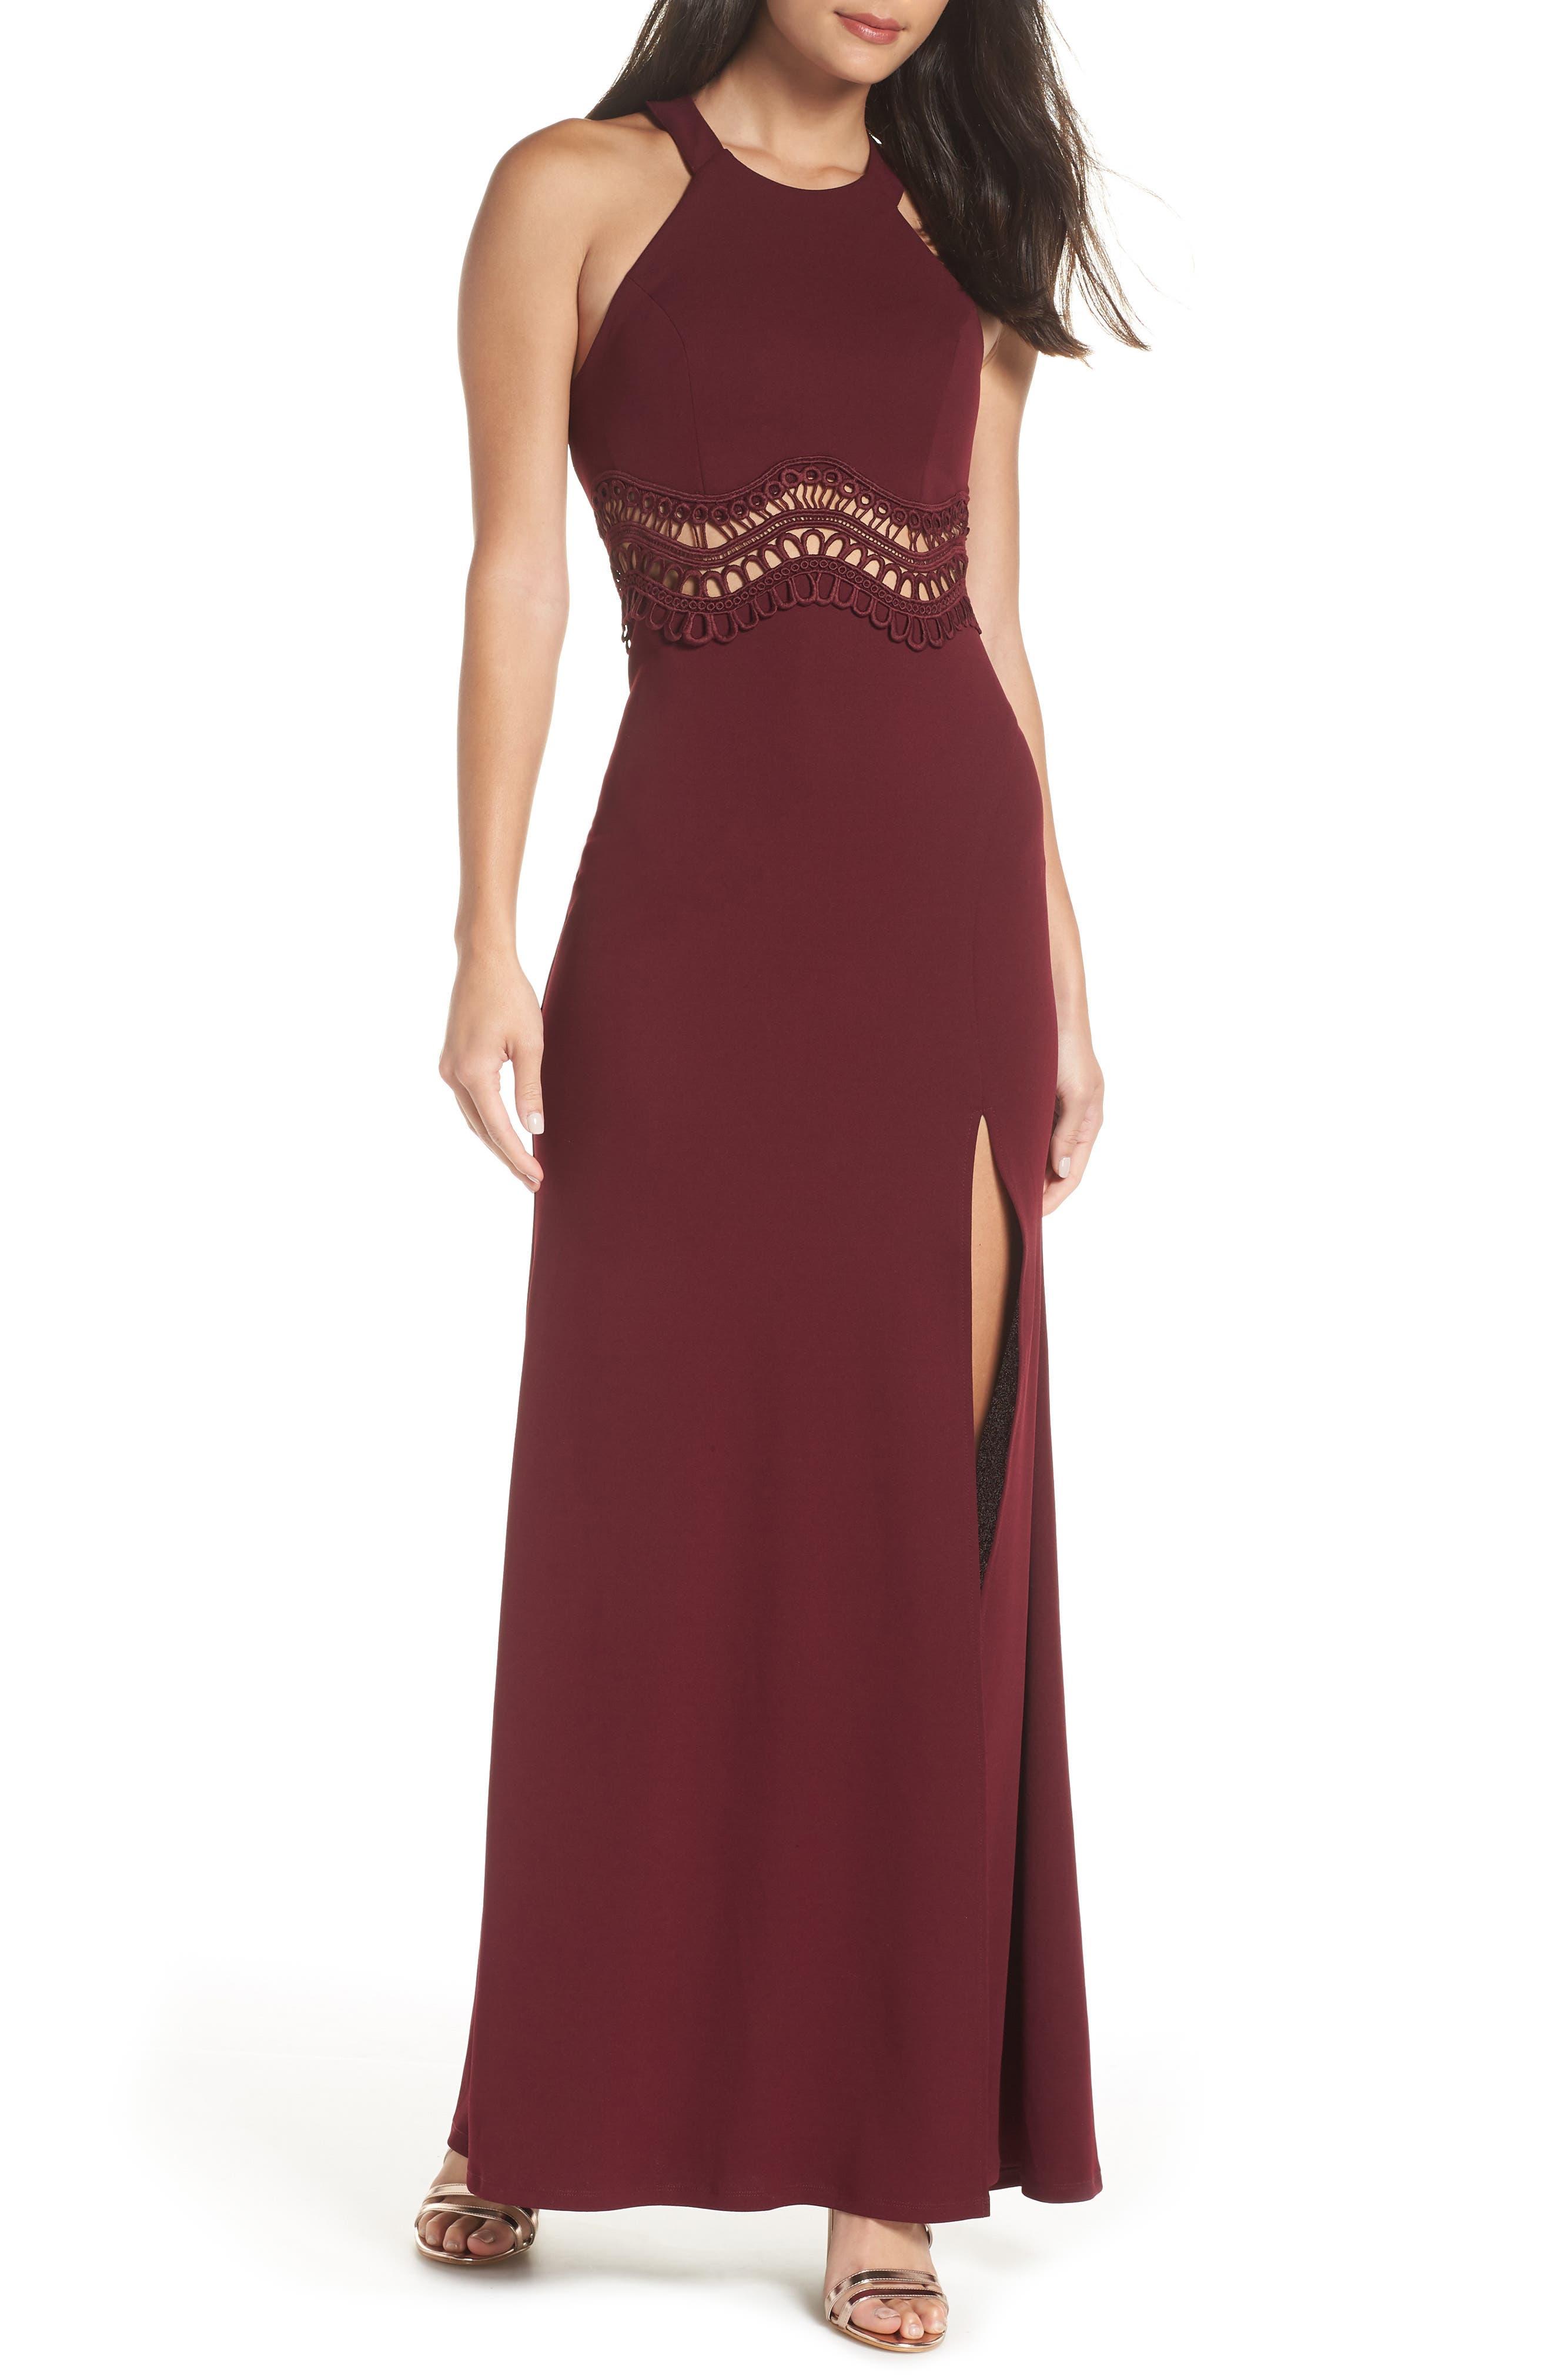 Sequin Hearts Front Slit Scuba Crepe Gown, Burgundy